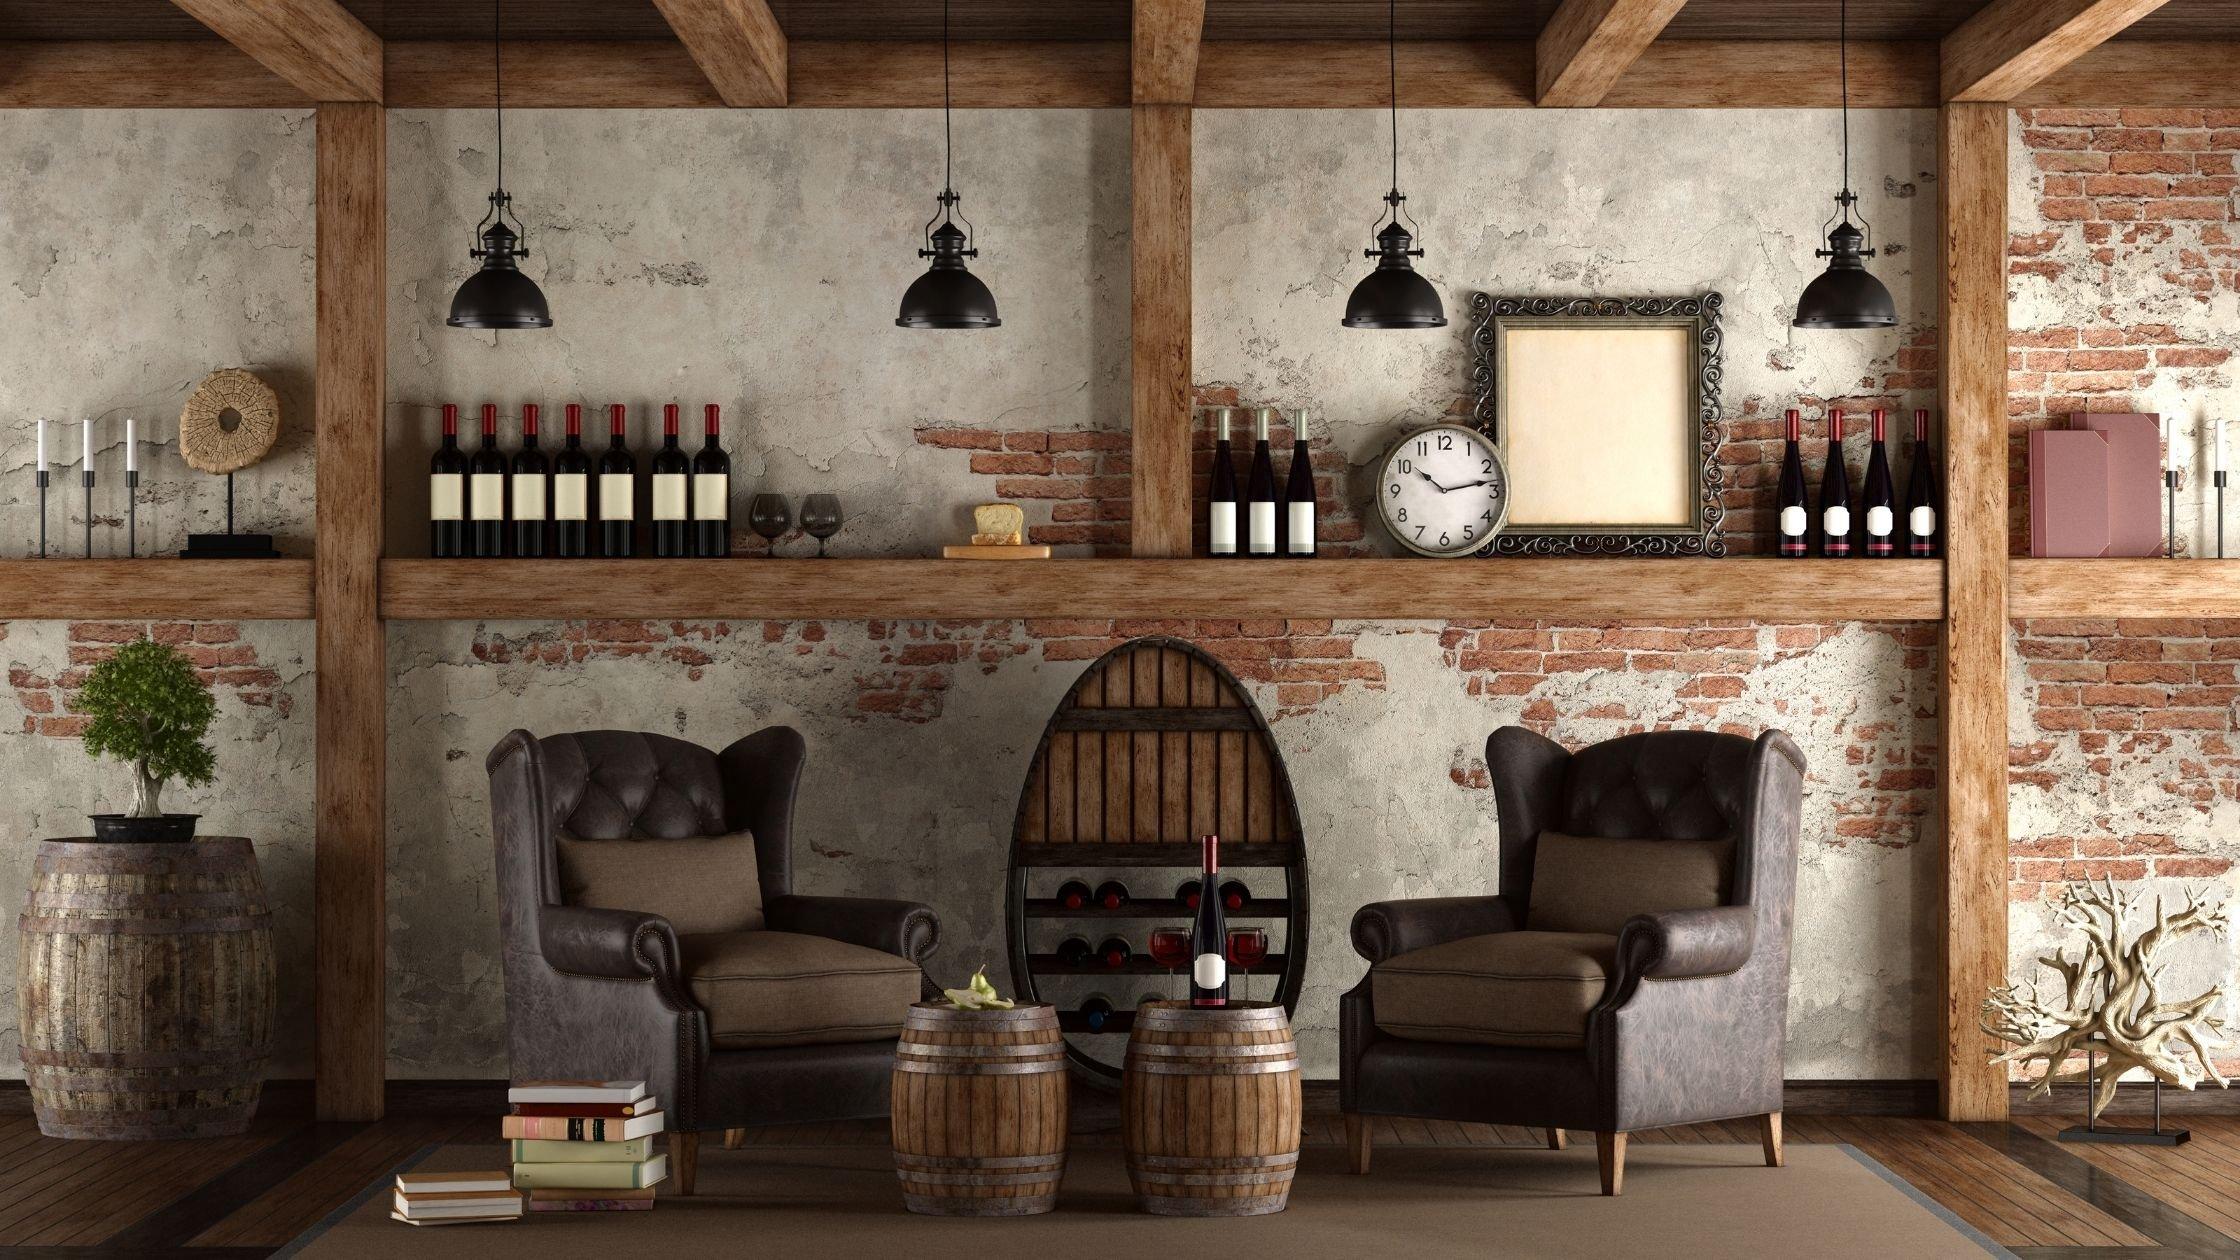 6 Custom Home Wine Cellar in New Jersey by GTG Builders